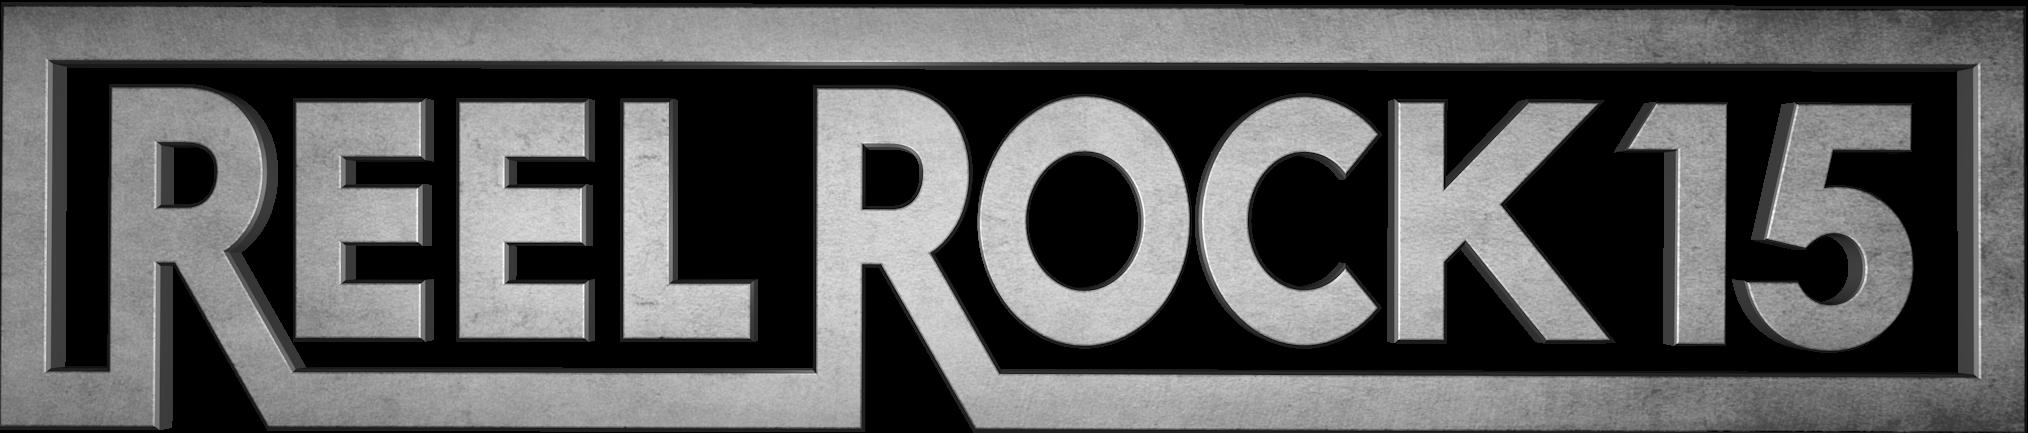 REEL ROCK 15 - South America